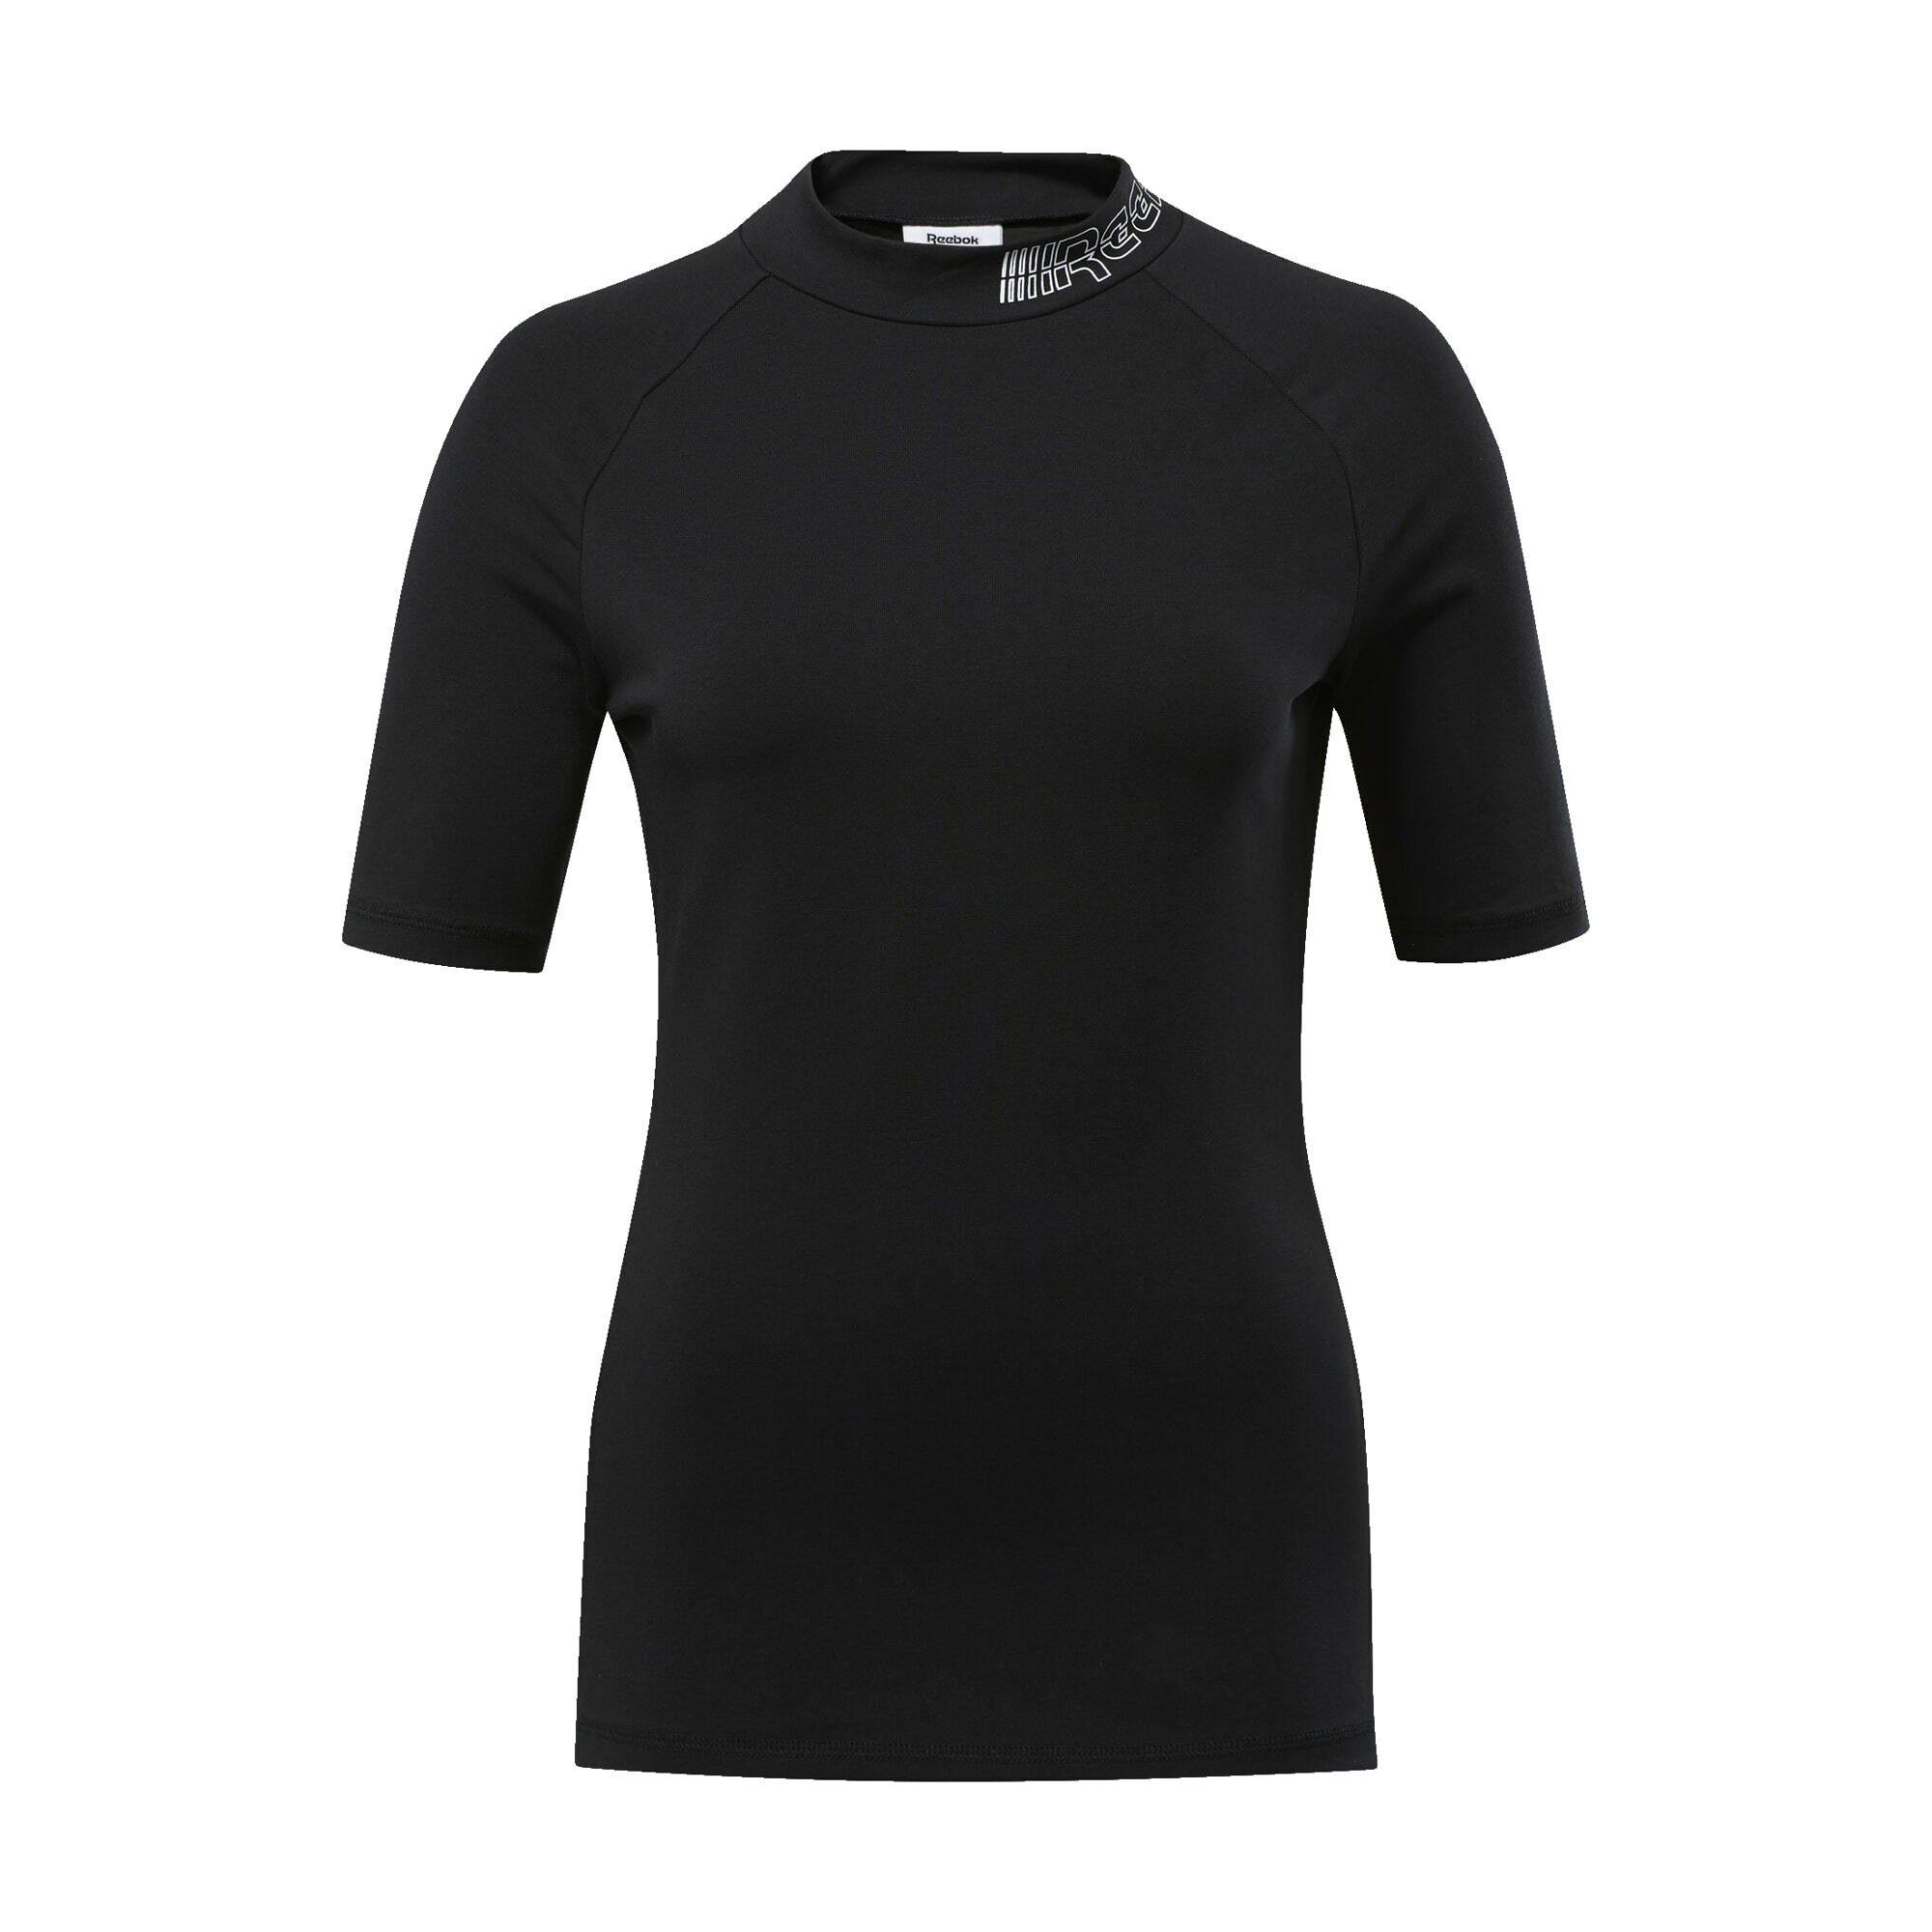 38 Longshirt mit Paillettenapplikation Tiger blau Heine Shirt Longsleeve Gr